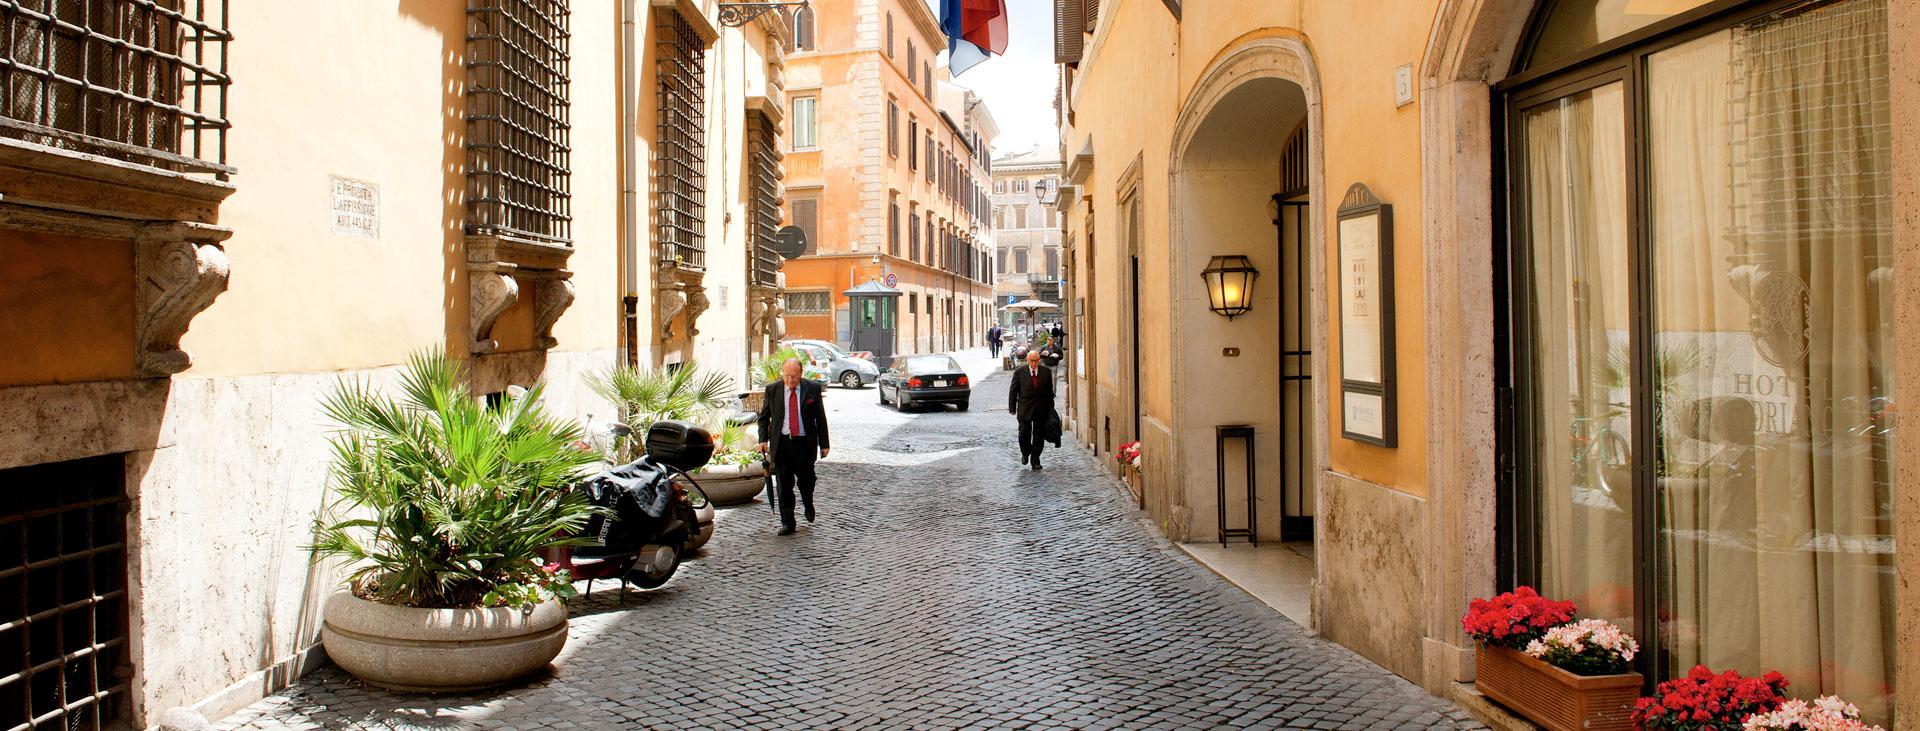 Adriano, Rom, Italien